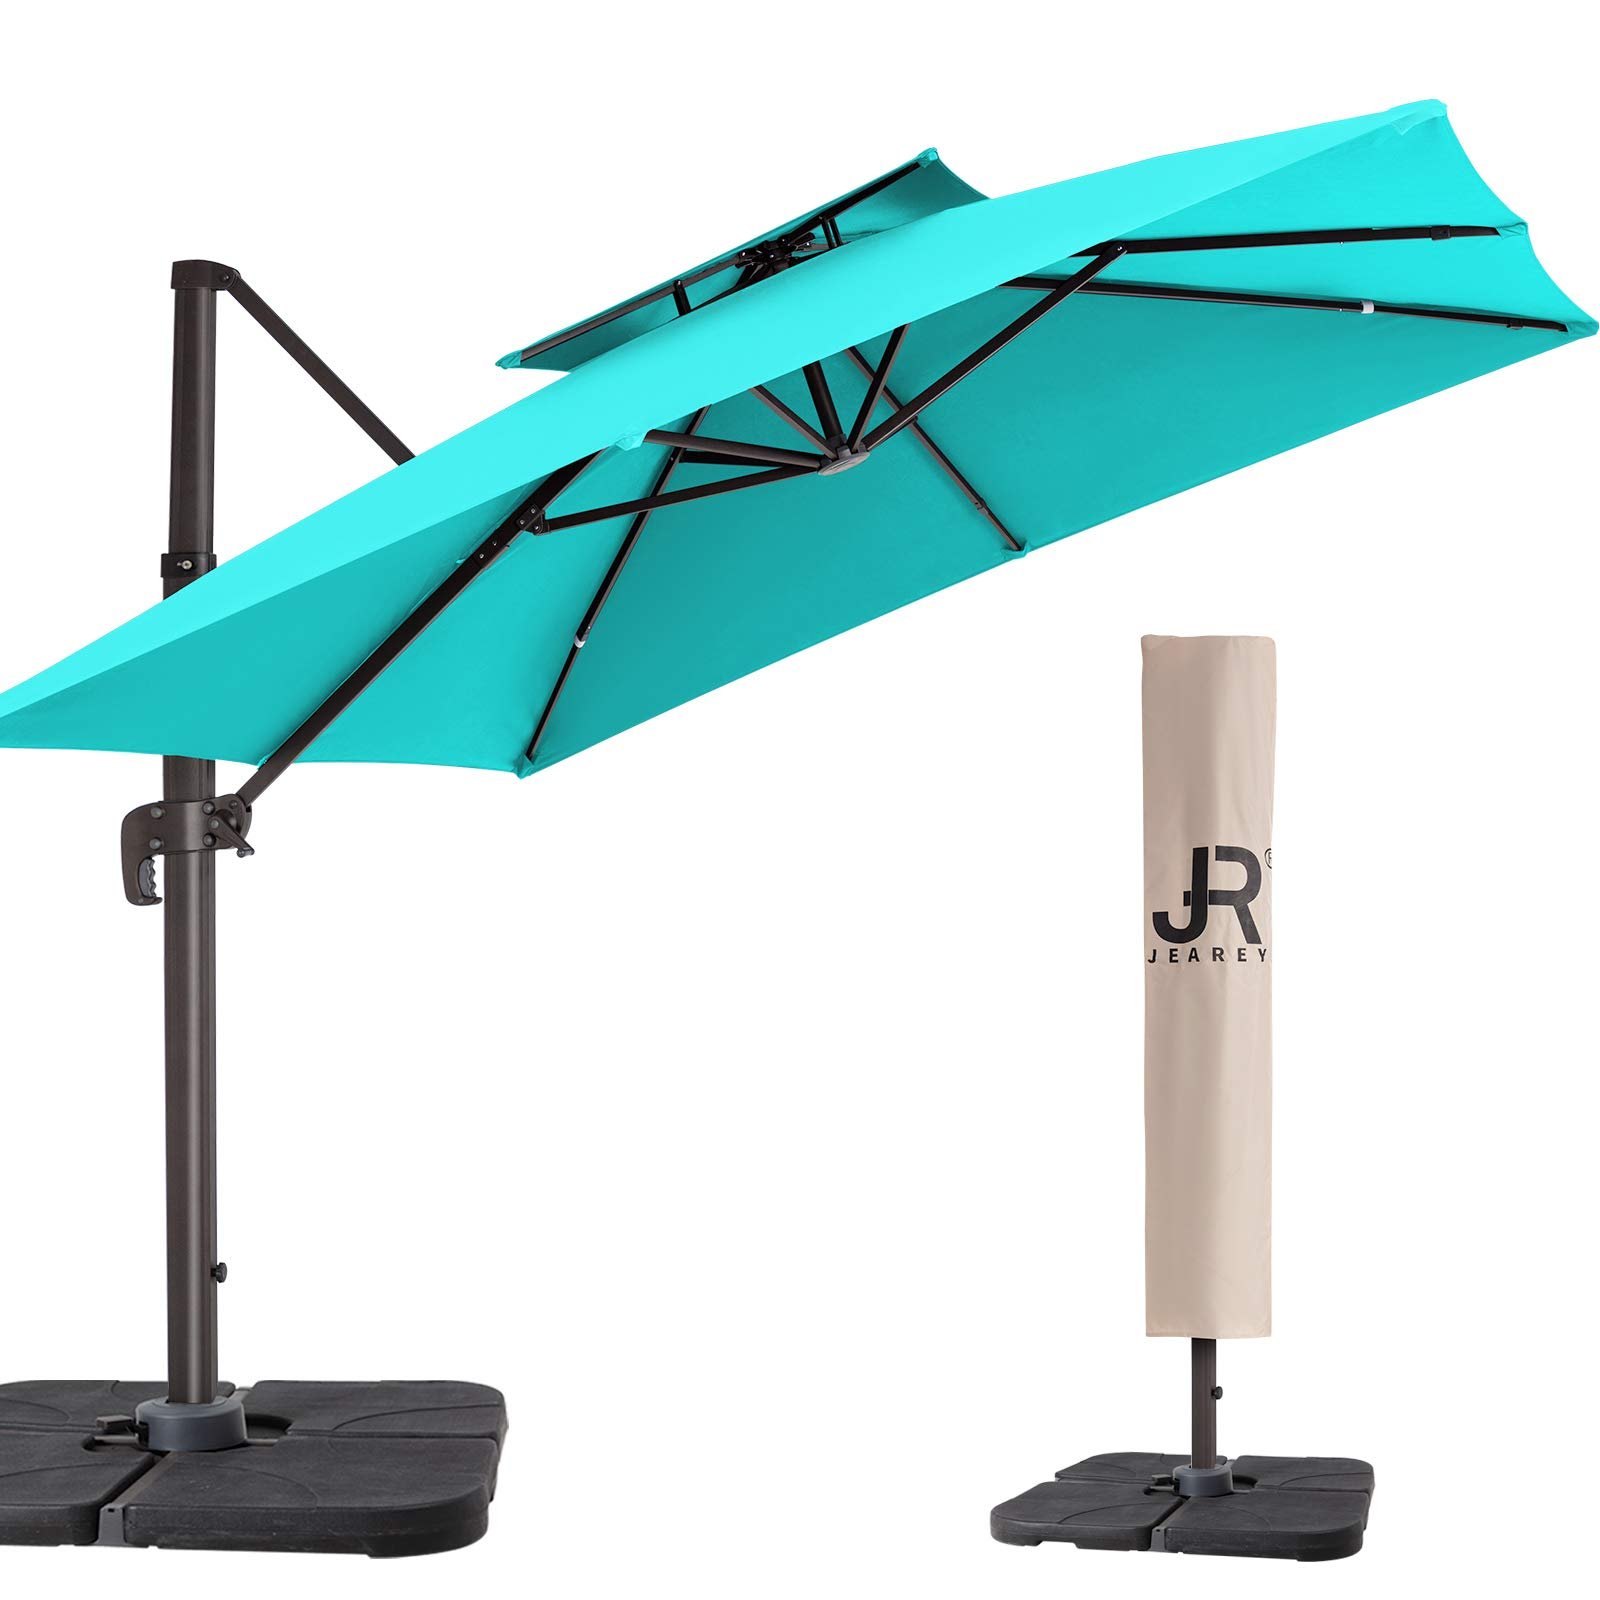 JEAREY 10FT Patio Umbrella Double Top Deluxe Square Hanging Patio Umbrella Offset Cantilever Outdoor Umbrella Heavy Duty Sun Umbrella for Market Garden Deck Backyard Pool Patio (SKY BLUE)